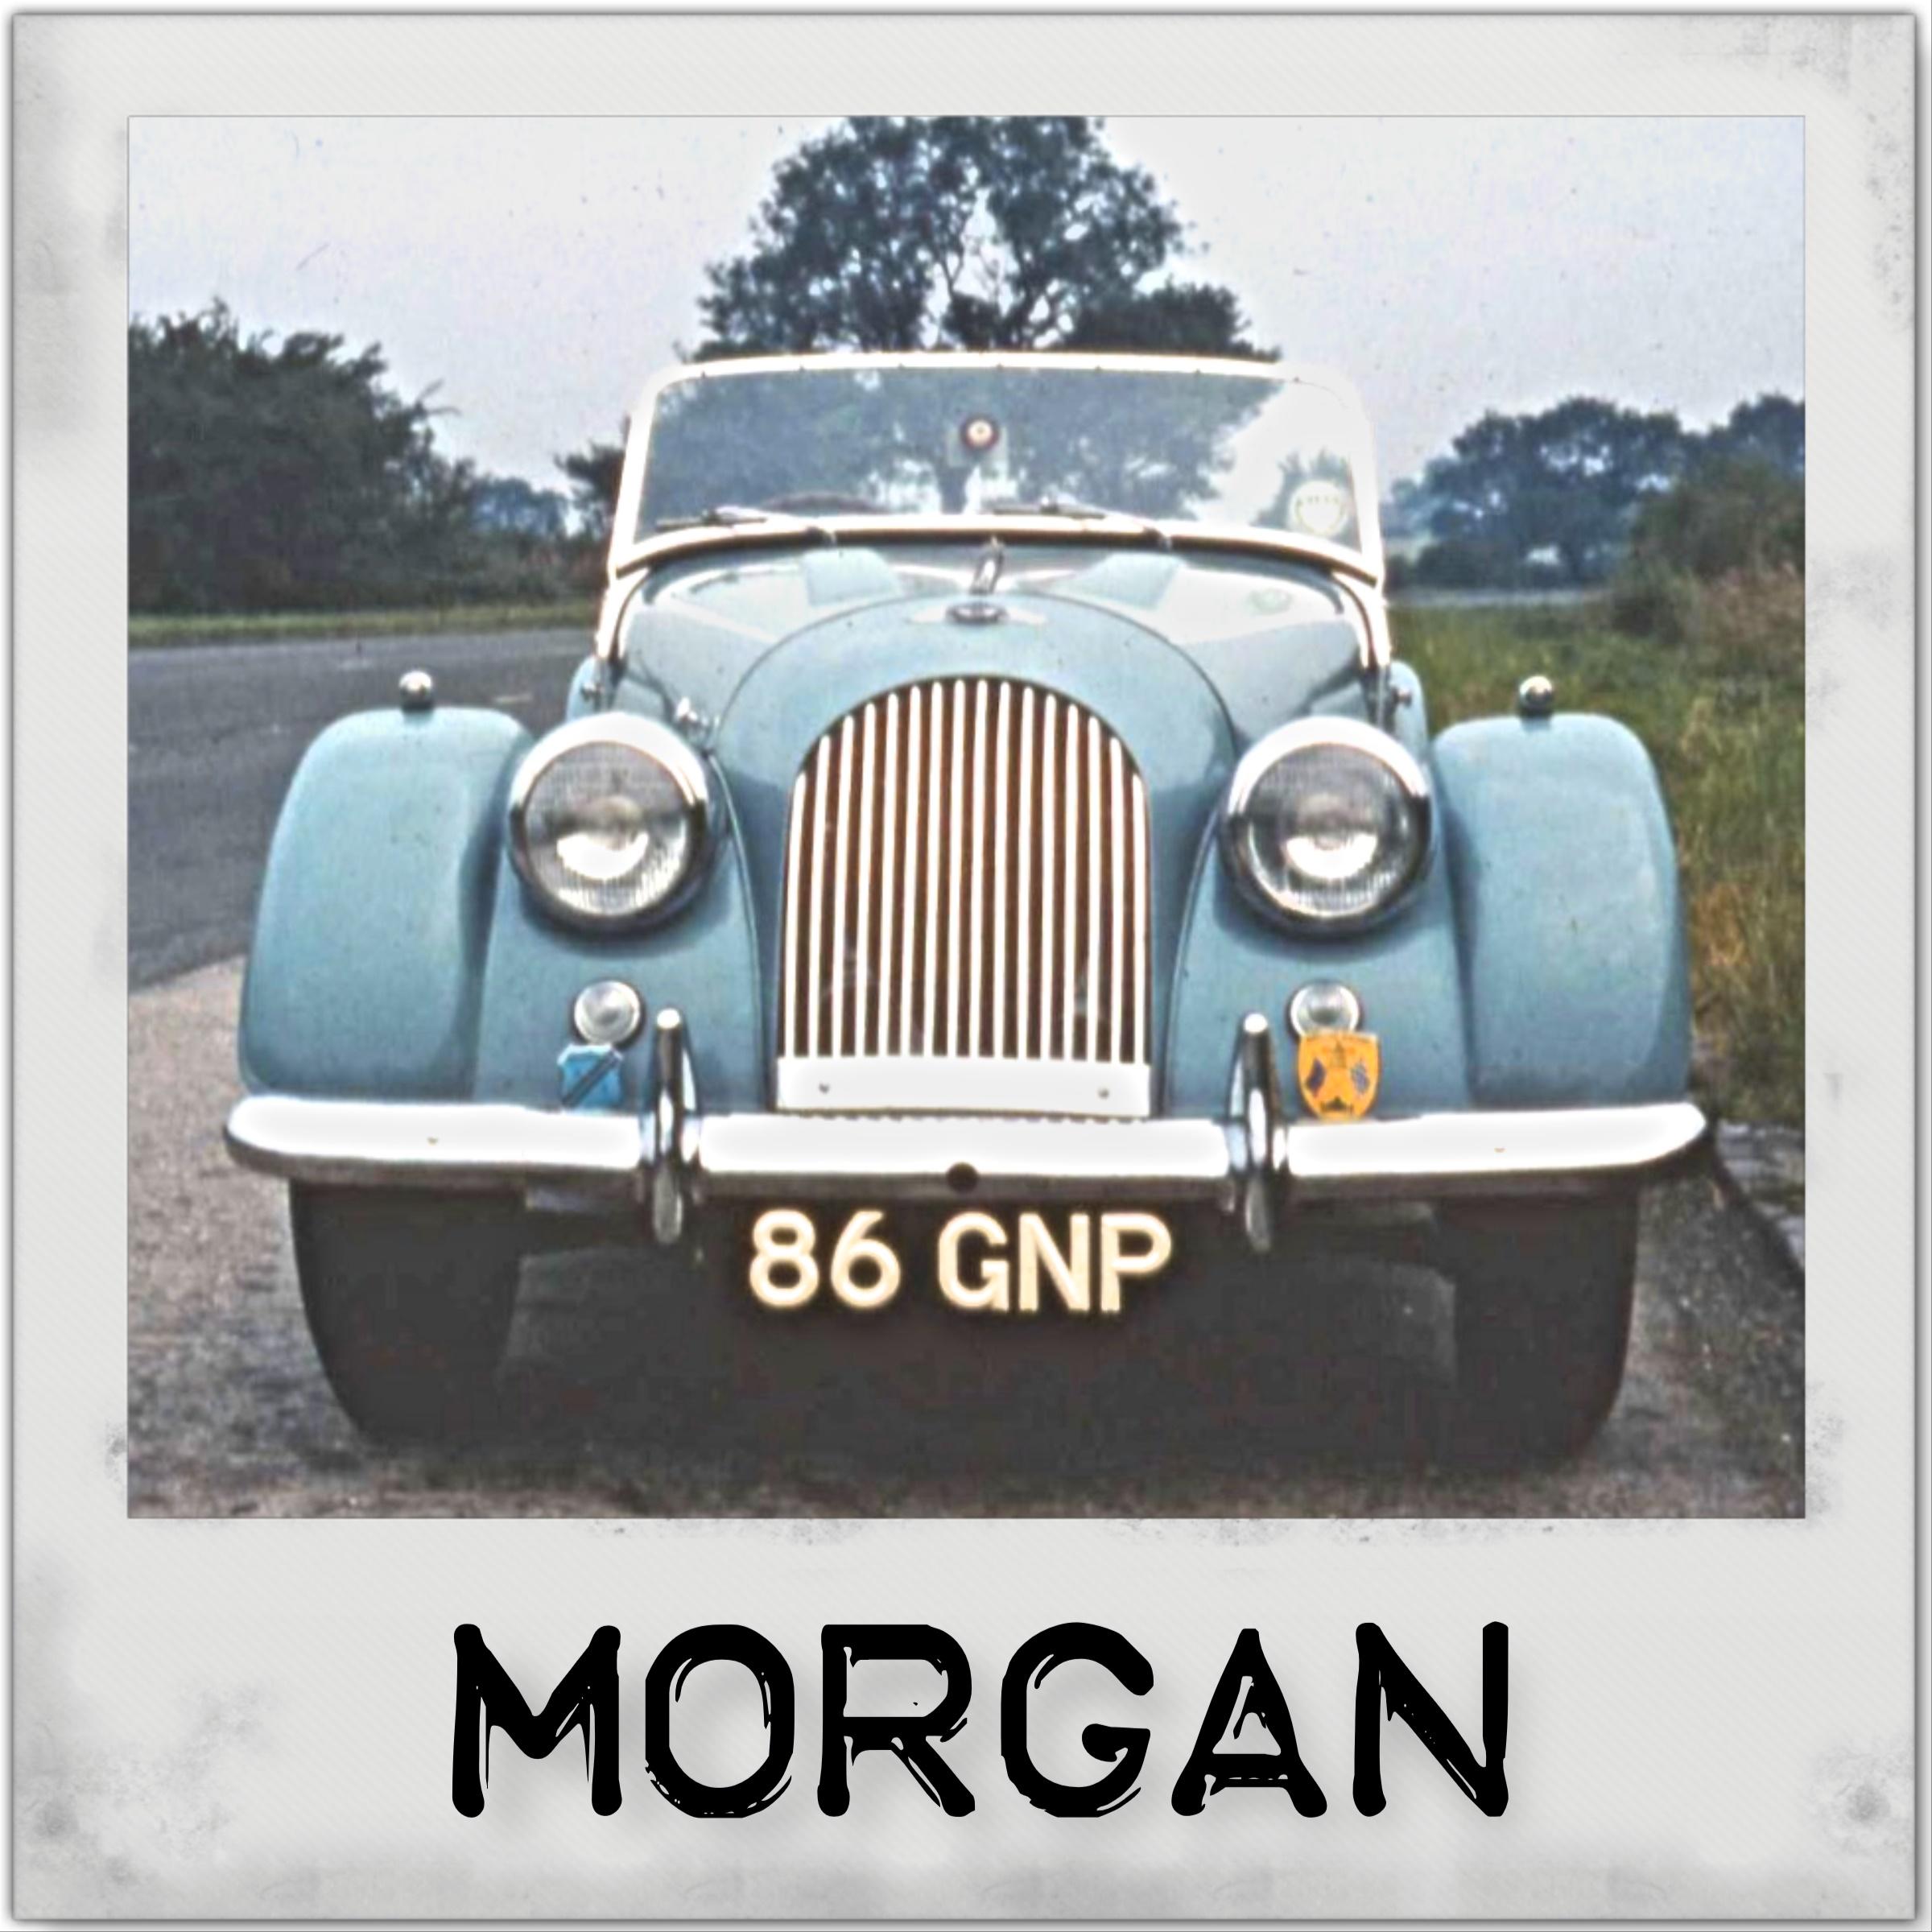 Morgan Parts